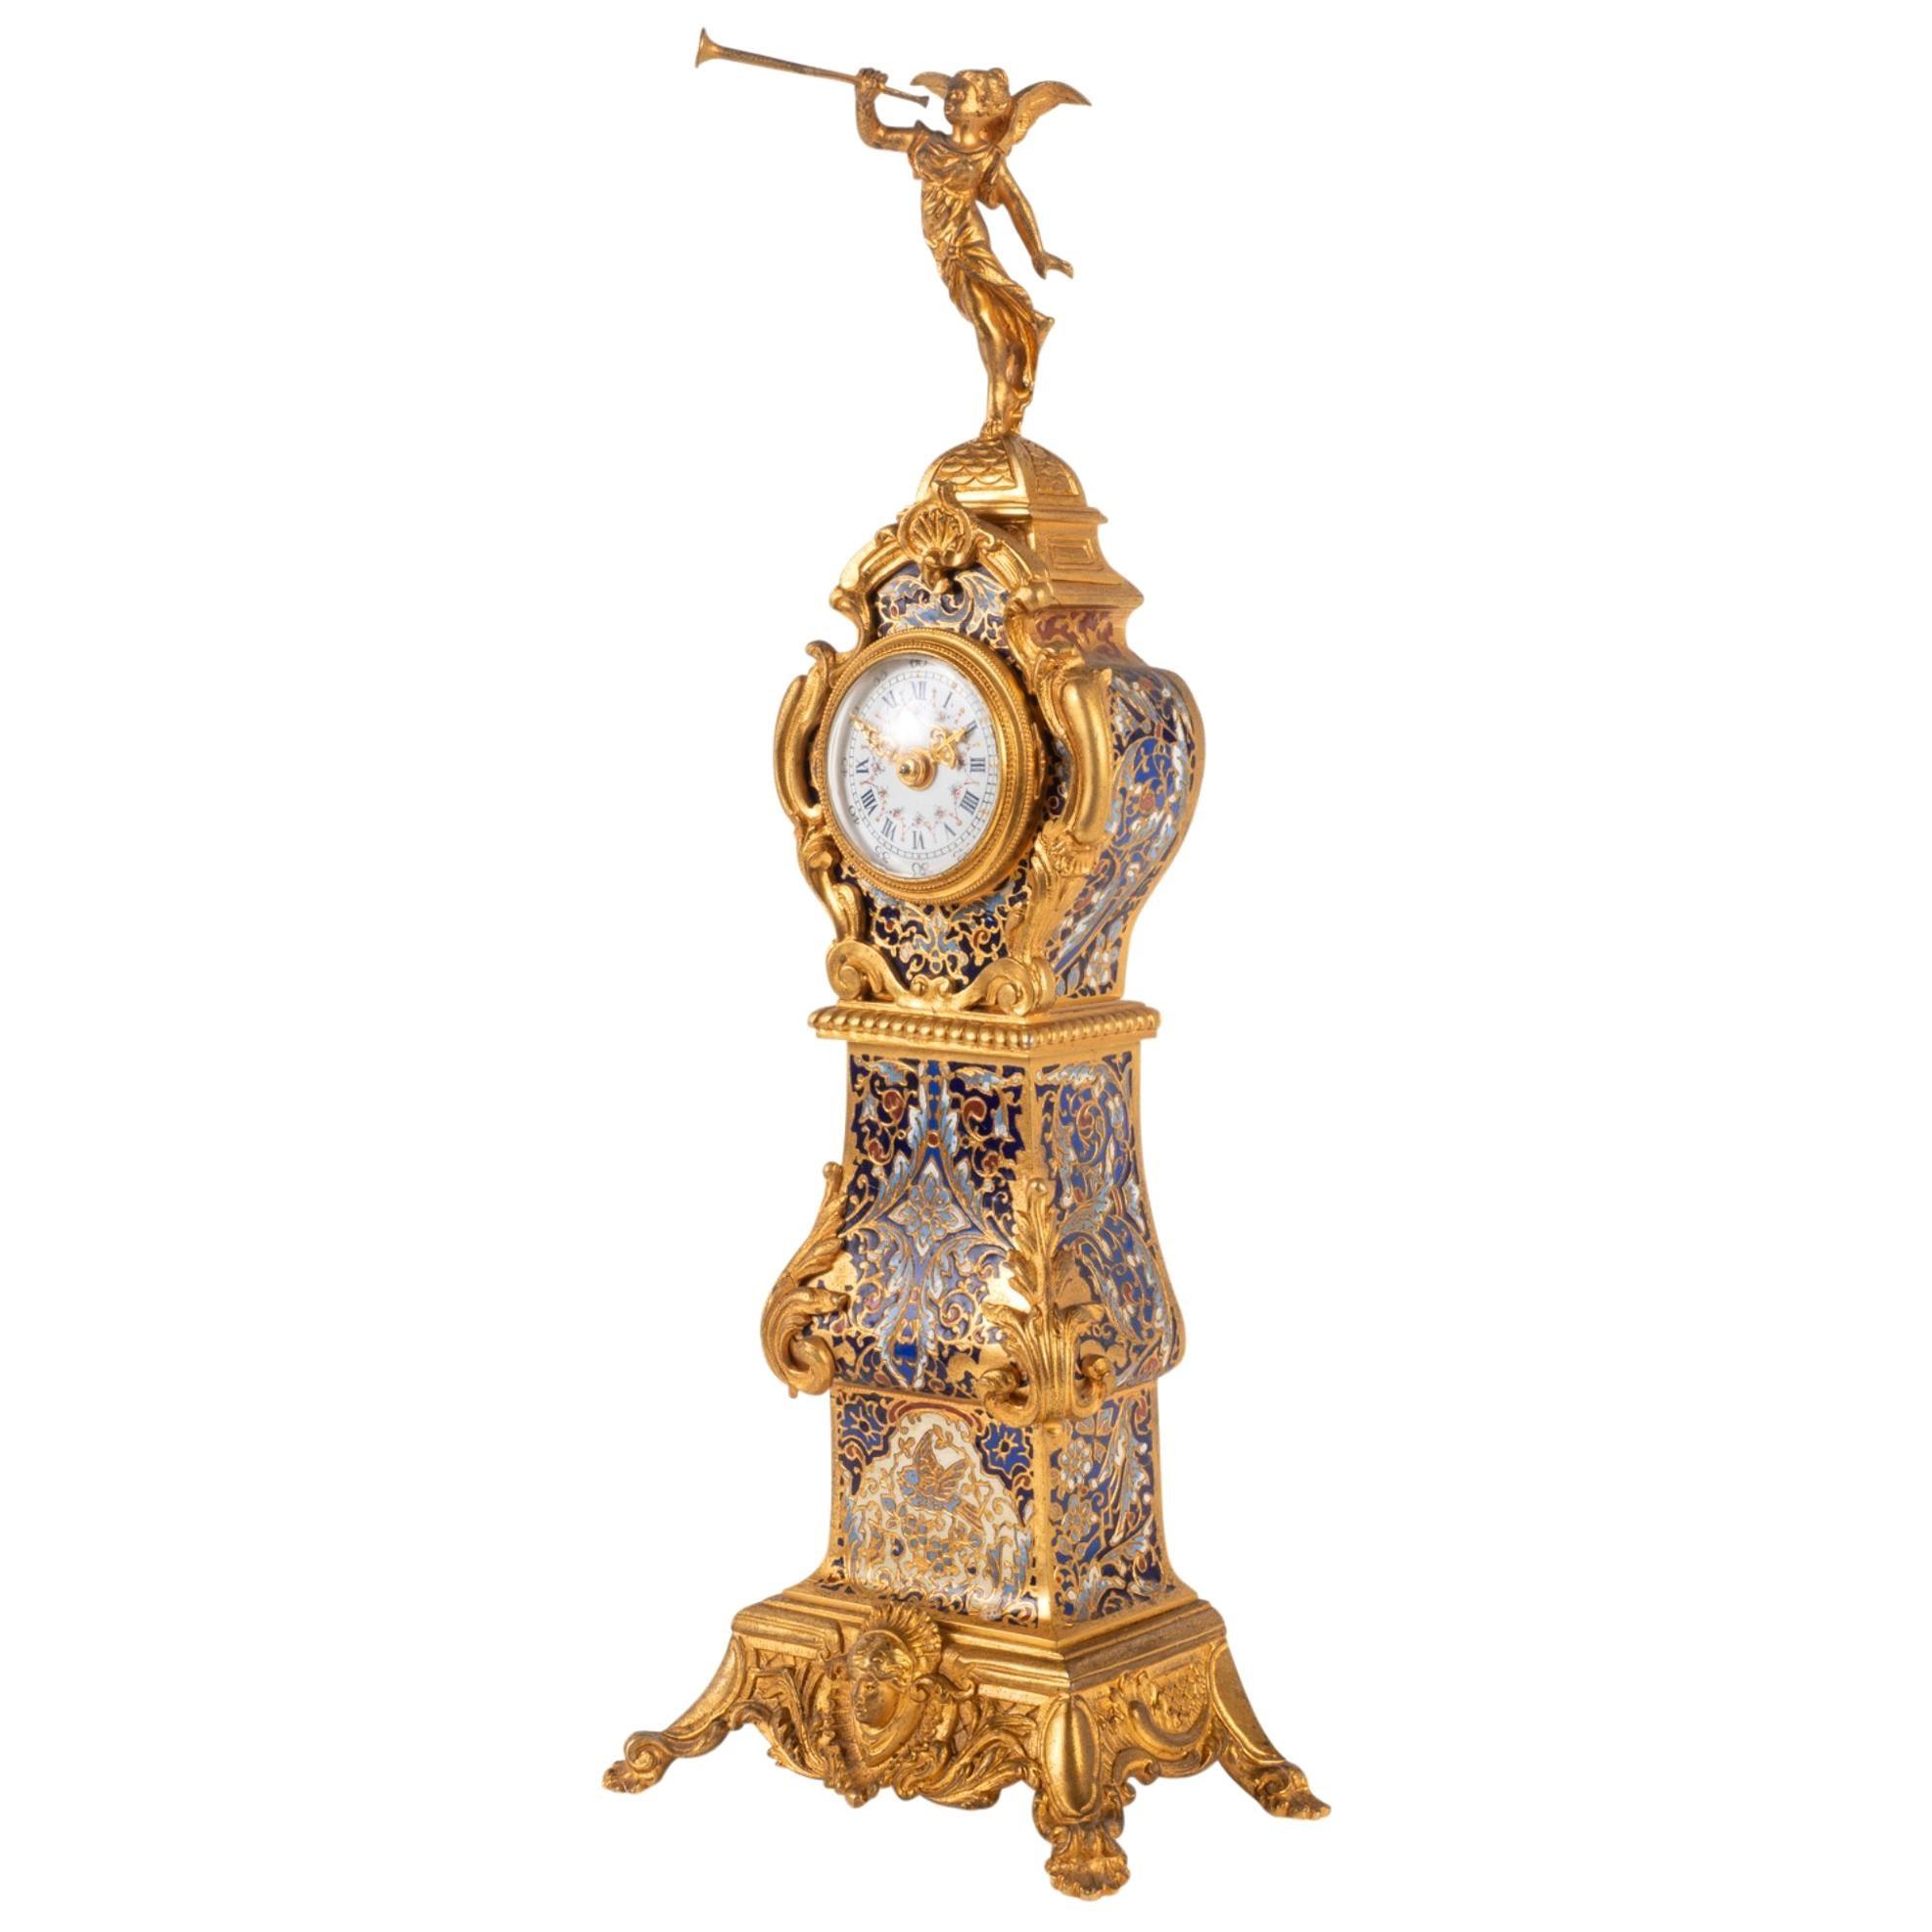 Late 19th Century Miniture French Longcase Clock High